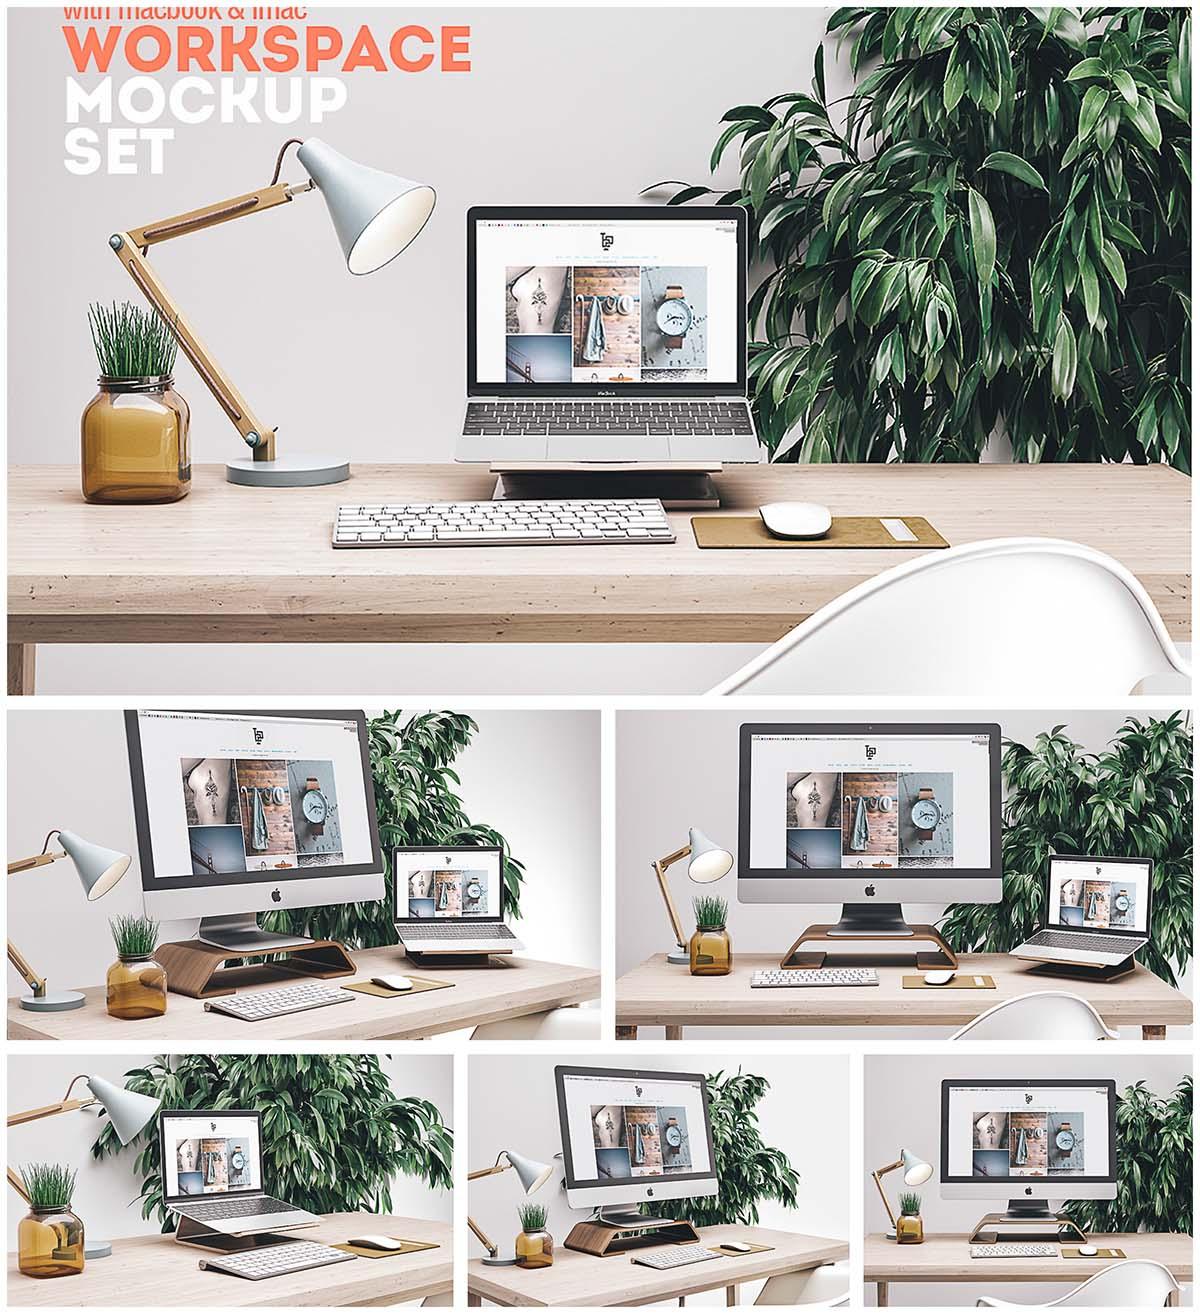 Macbook and IMac mockup workspace